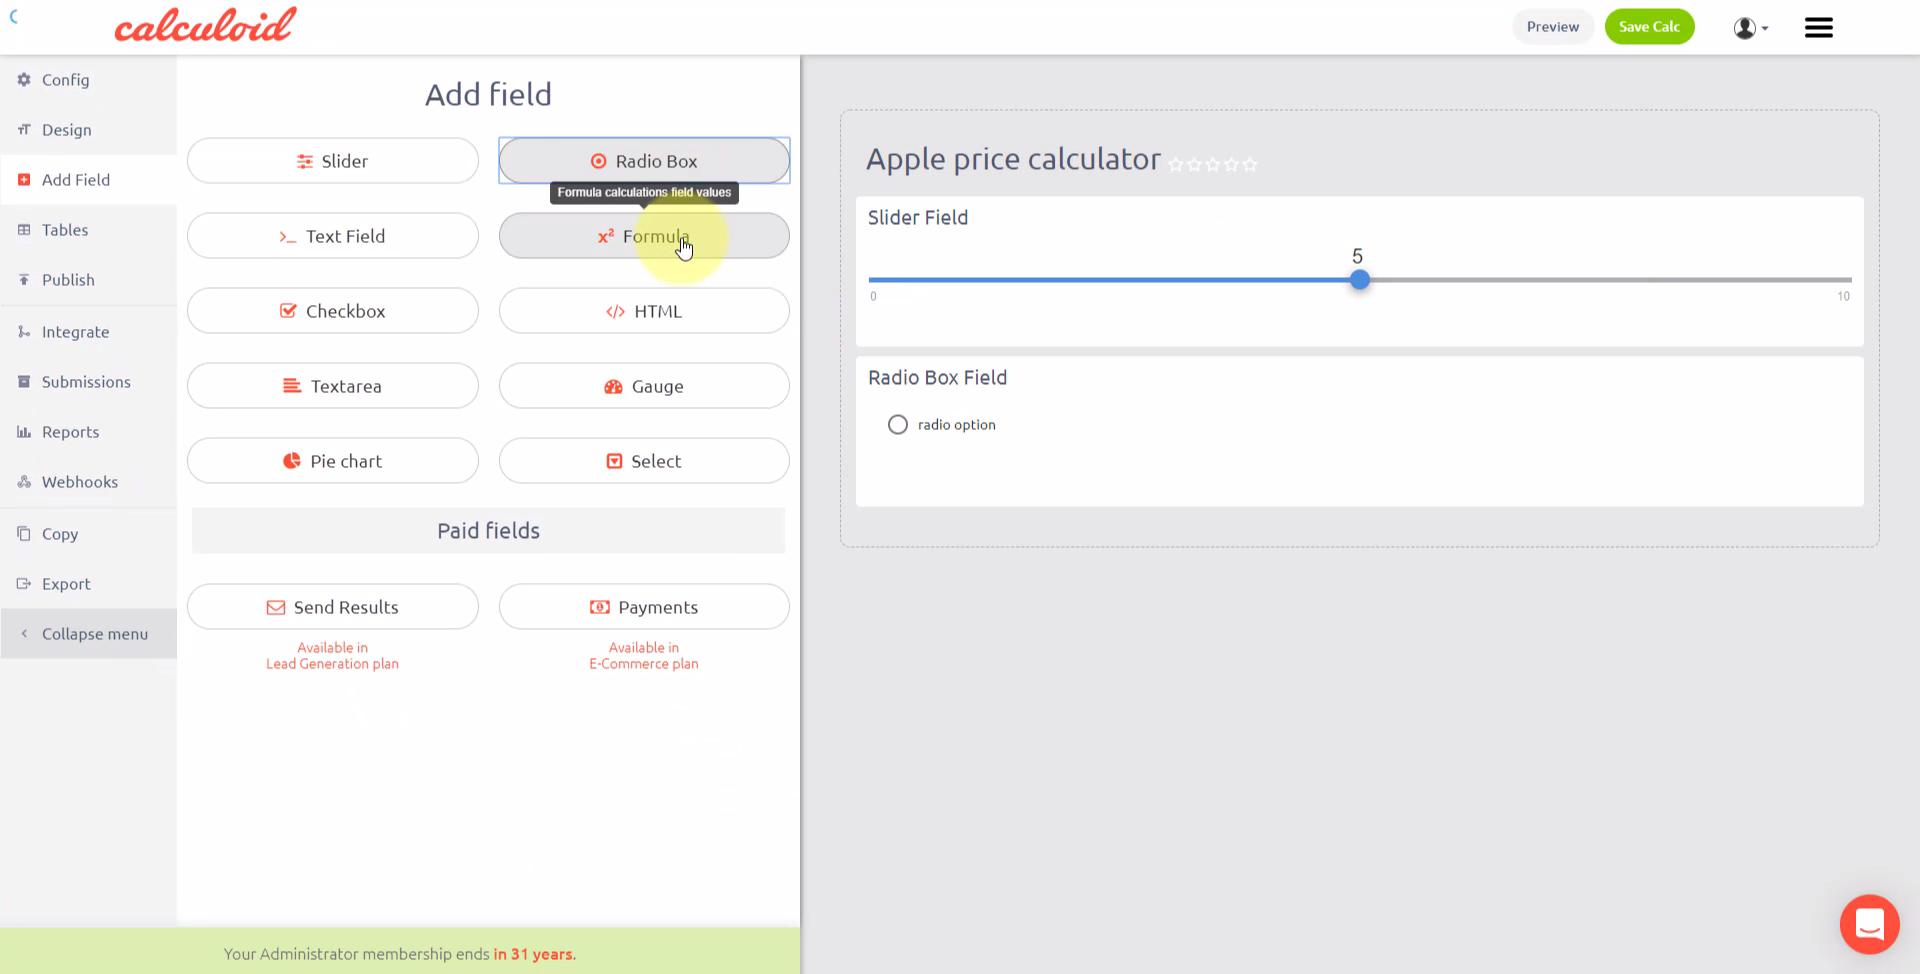 Online obchod kalkulačka šablona - Calculoid.com